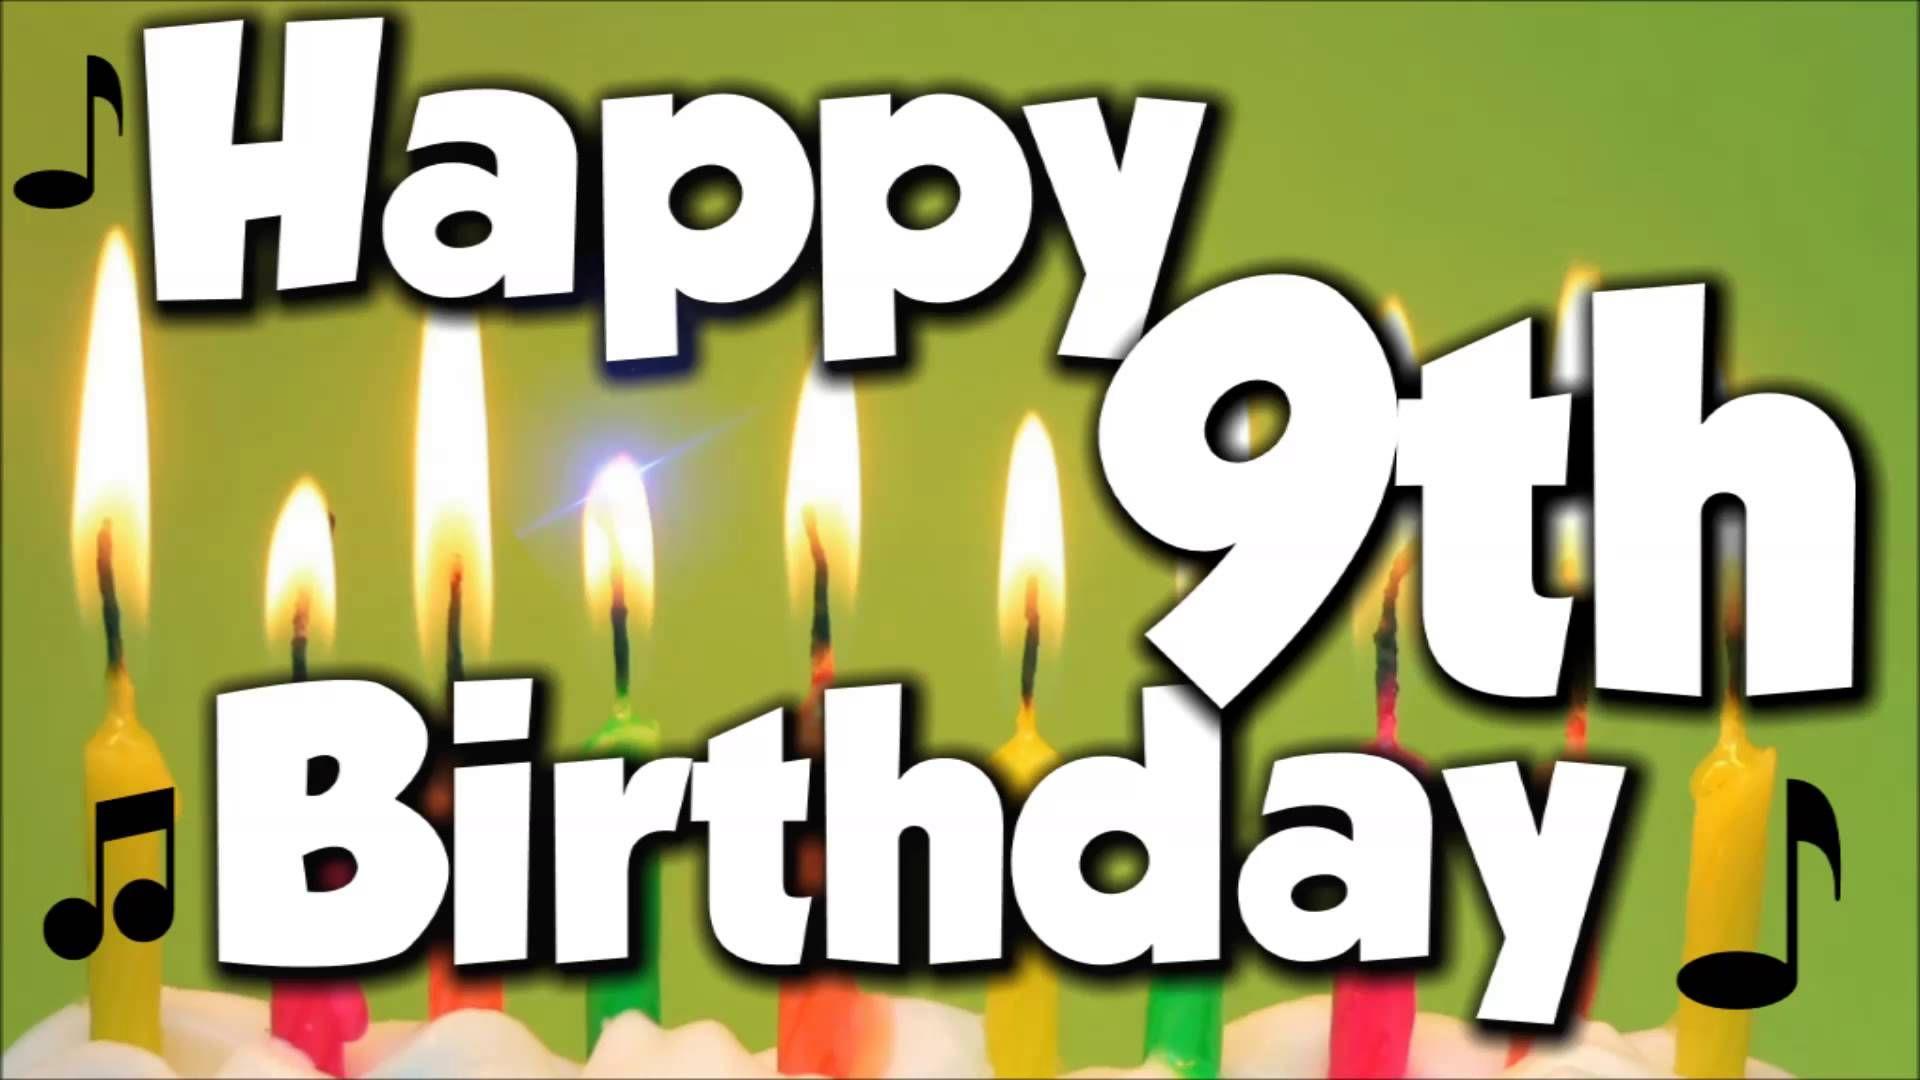 Happy 9th Birthday Happy Birthday To You Song Happy 25th Birthday Happy 10th Birthday Happy 28th Birthday